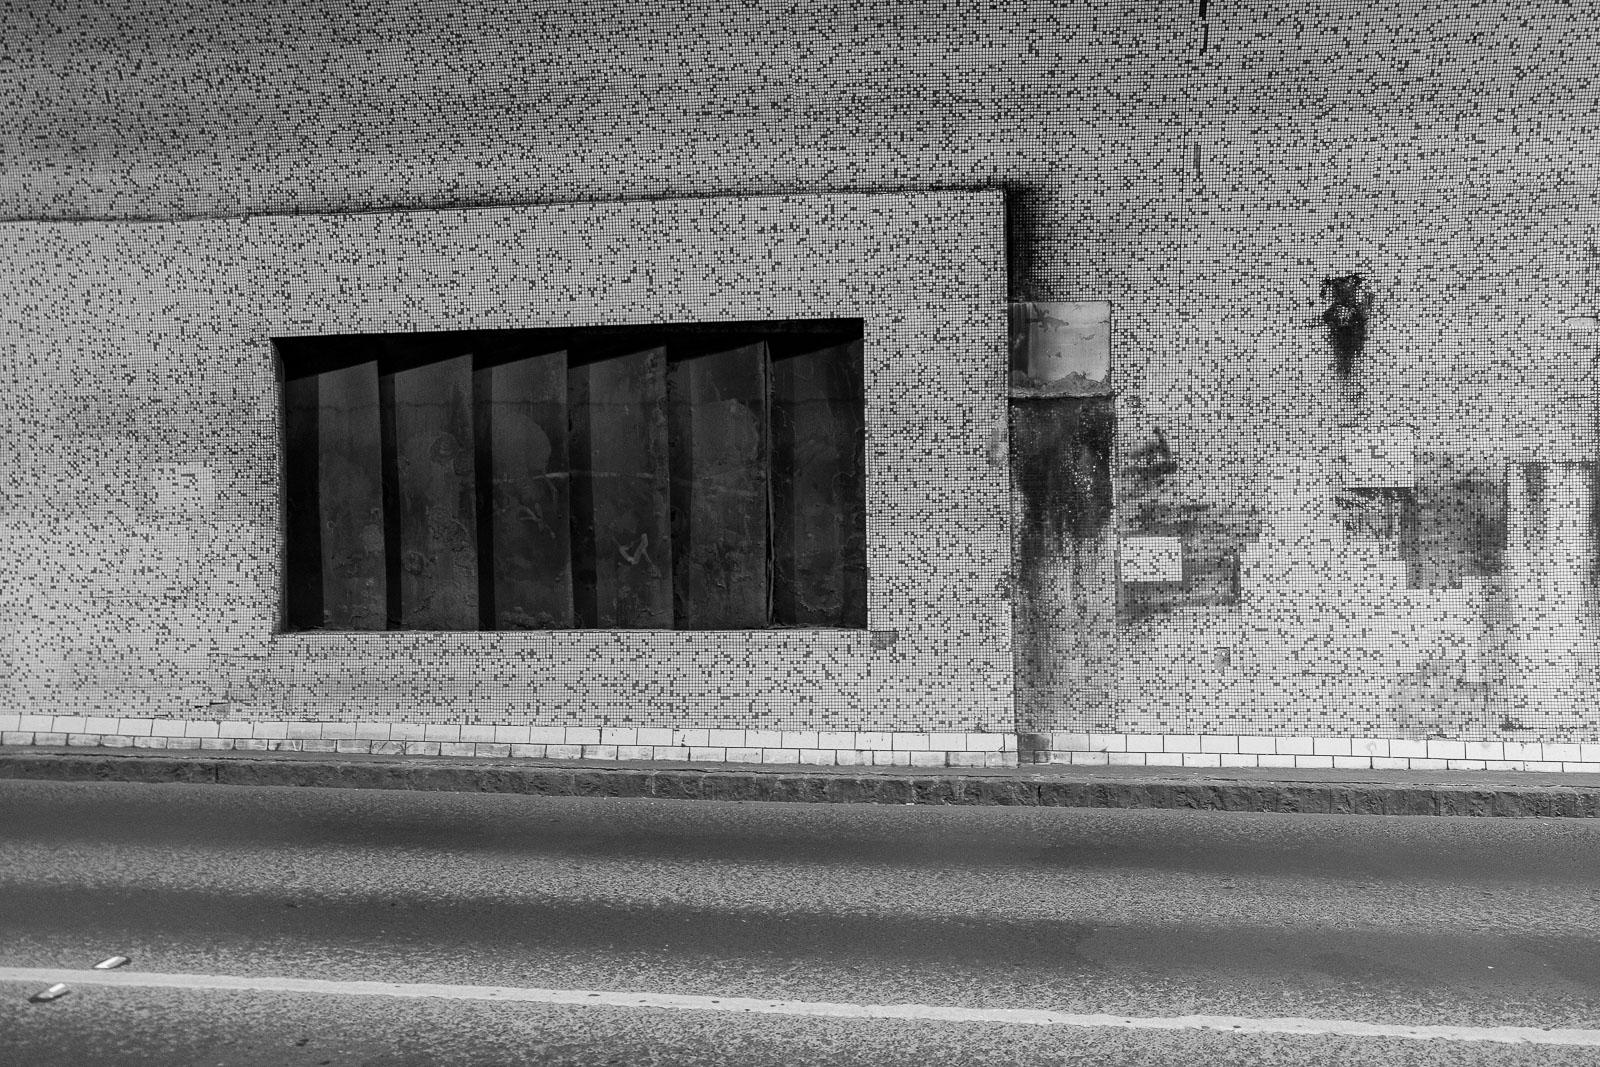 budapest-28.jpg